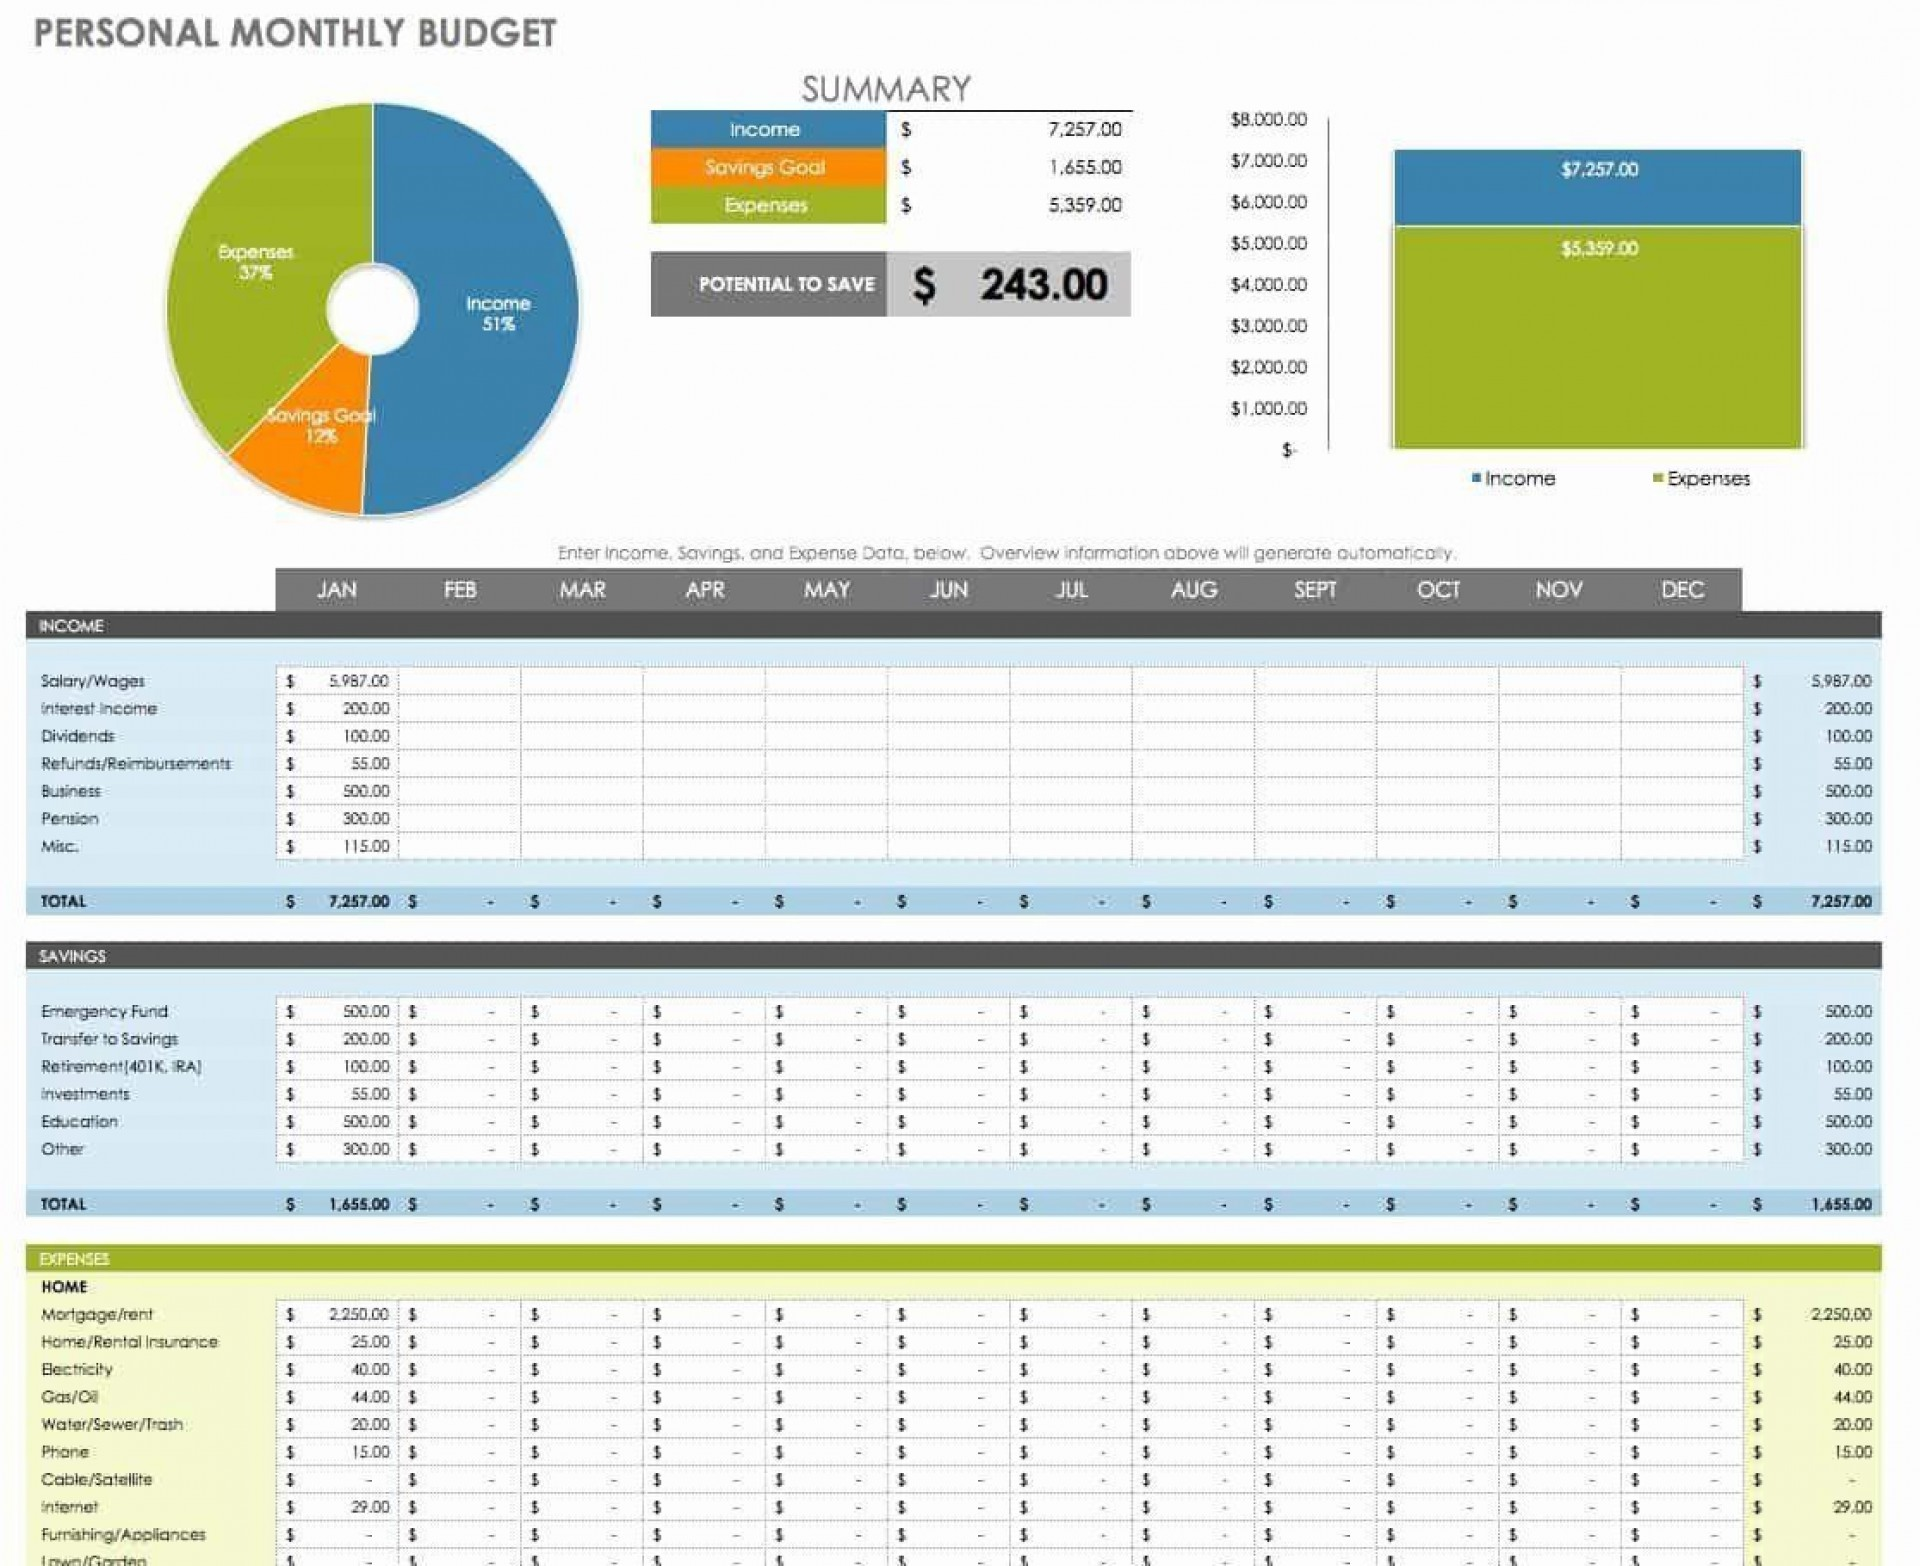 006 Fantastic Personal Budget Sheet Template Uk High Definition  Spreadsheet1920